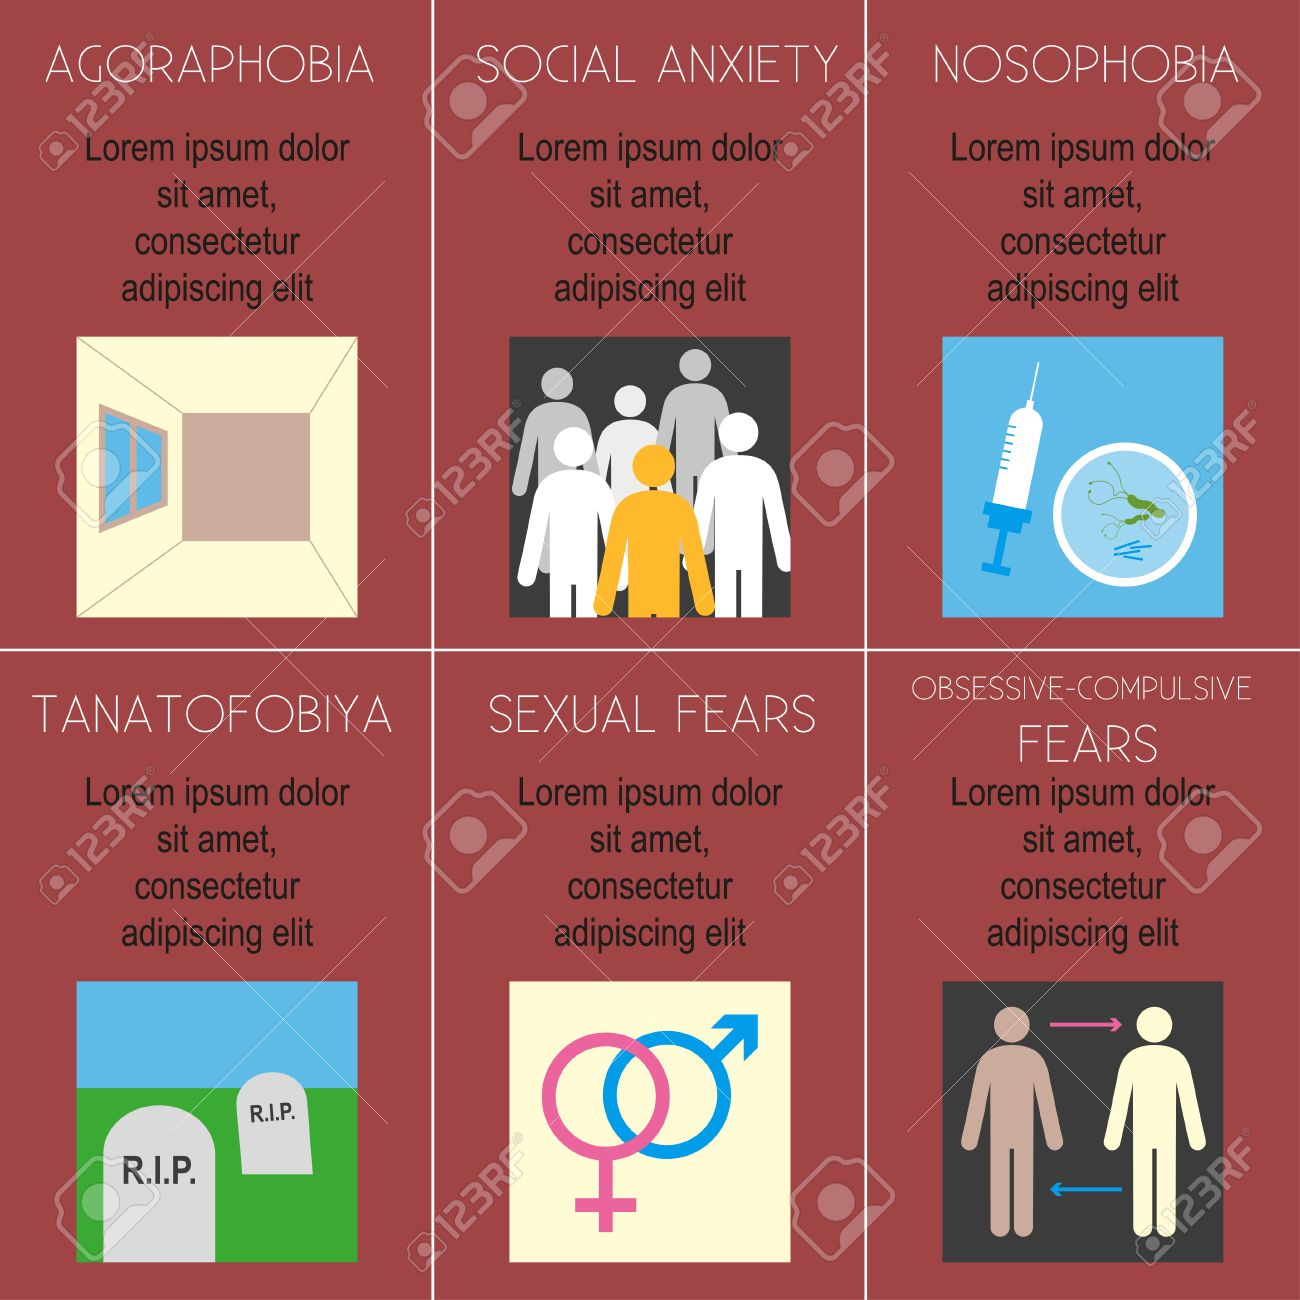 Poster design description - Poster Design Description Poster With The Title And Description Of Phobias Various Phobias Flat Design